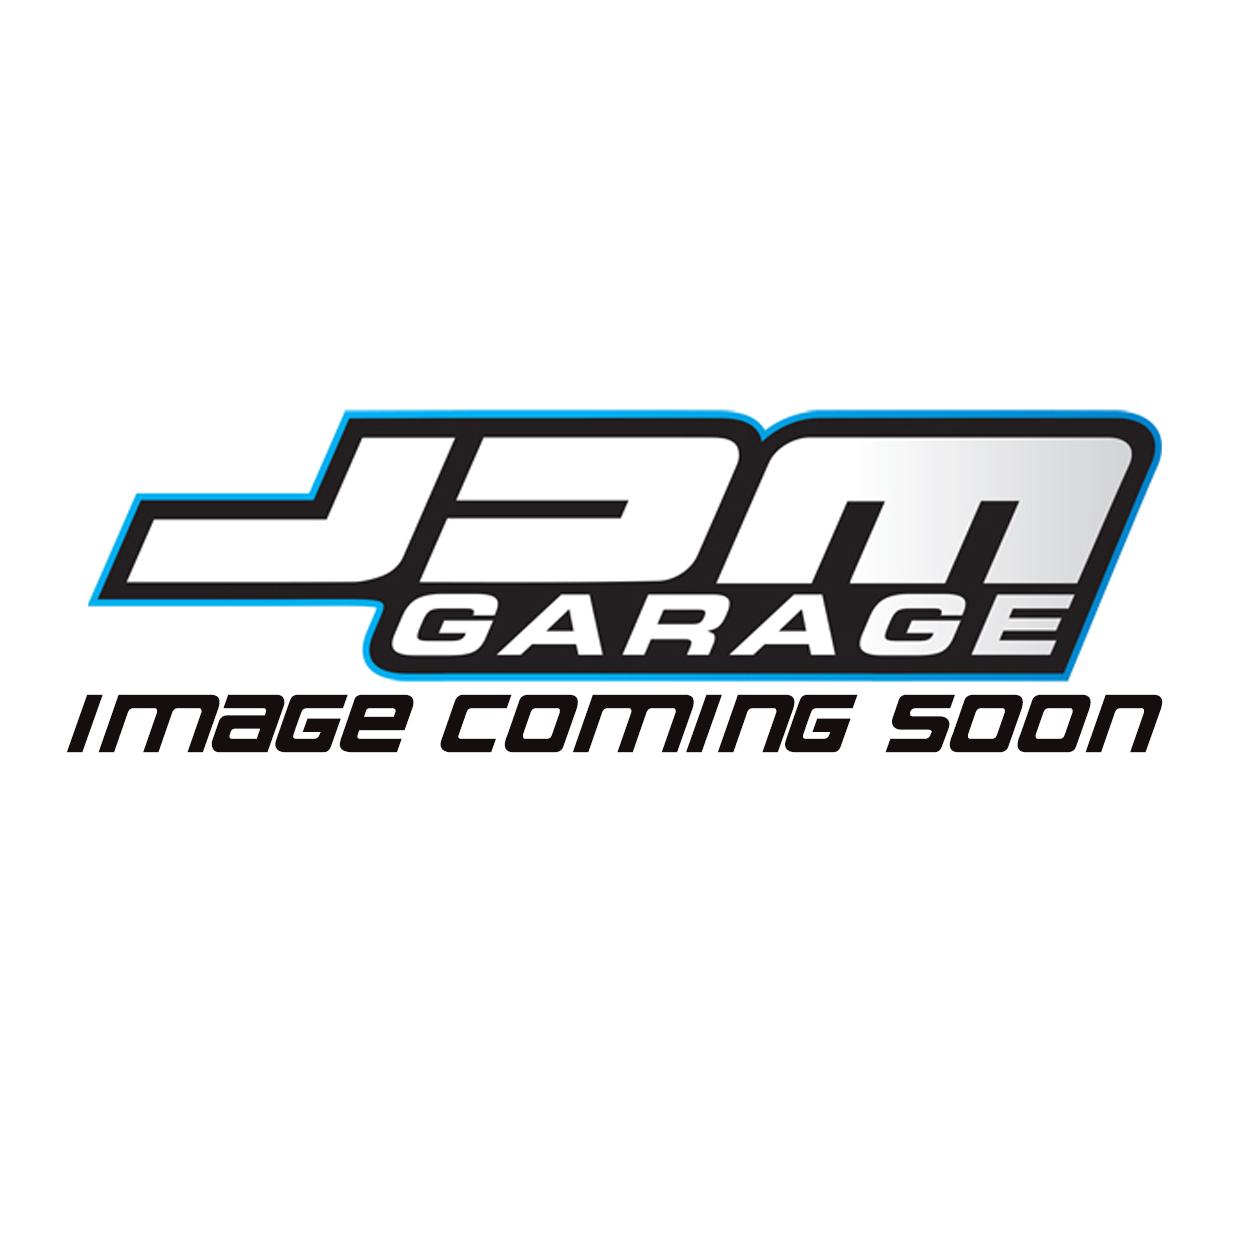 Genuine Crankshaft Sprocket Pulley Plate Fits Nissan Skyline R32 R33 R34 GTST GTR / Stagea WC34 260RS RB25DET RB26DETT 13022-05U10